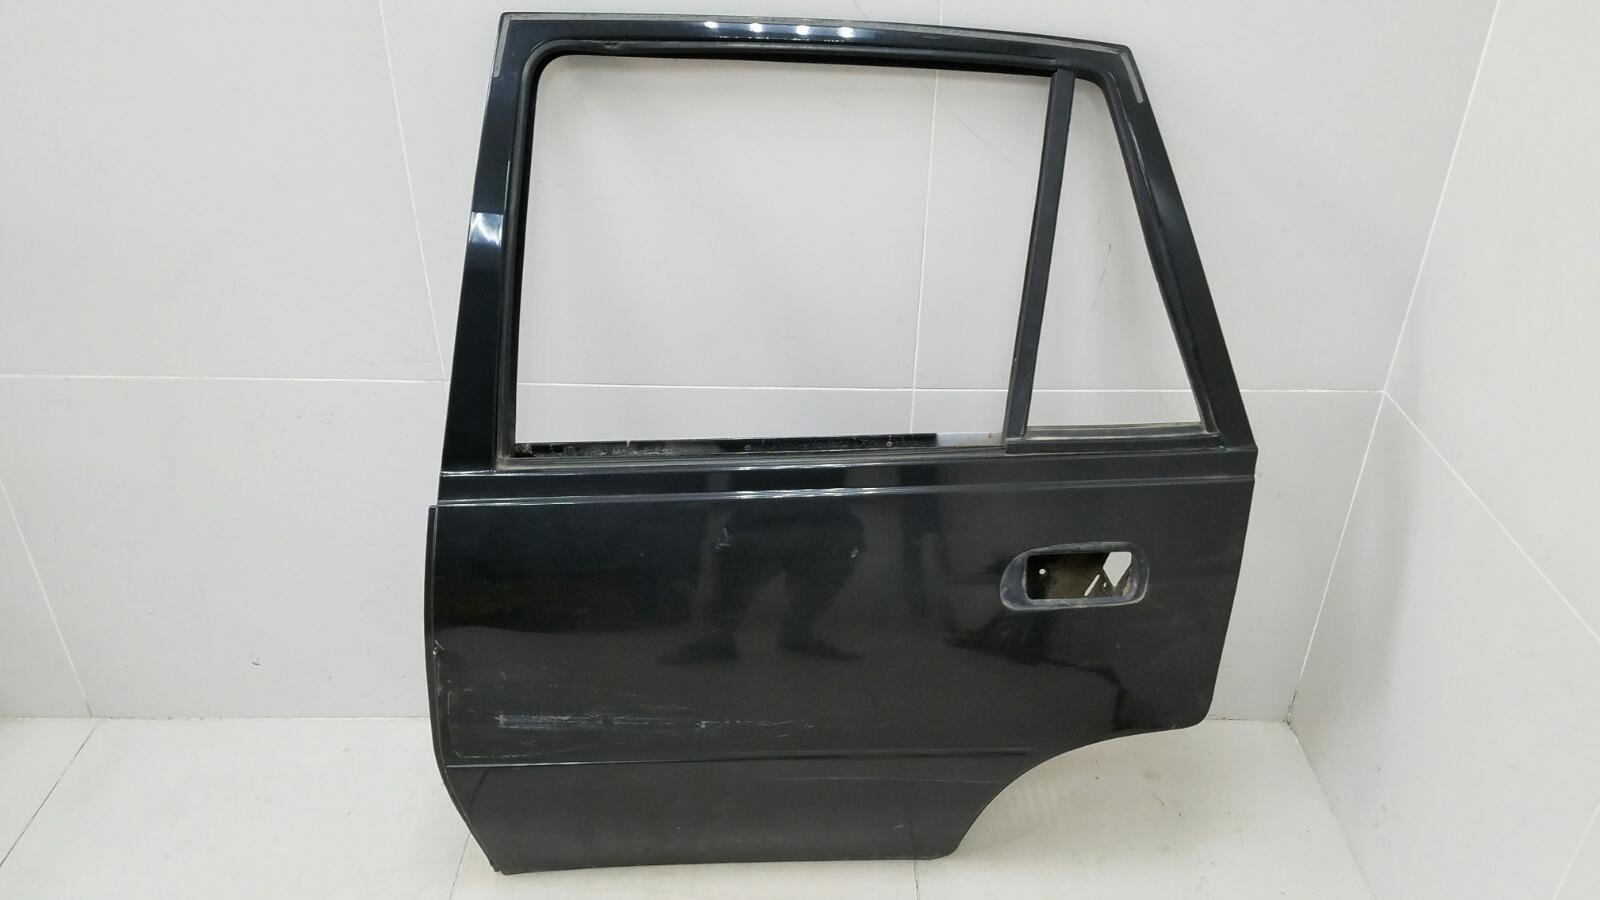 Дверь Daewoo Nexia N150 A15SMS 1.5Л SOHC 2008 задняя левая